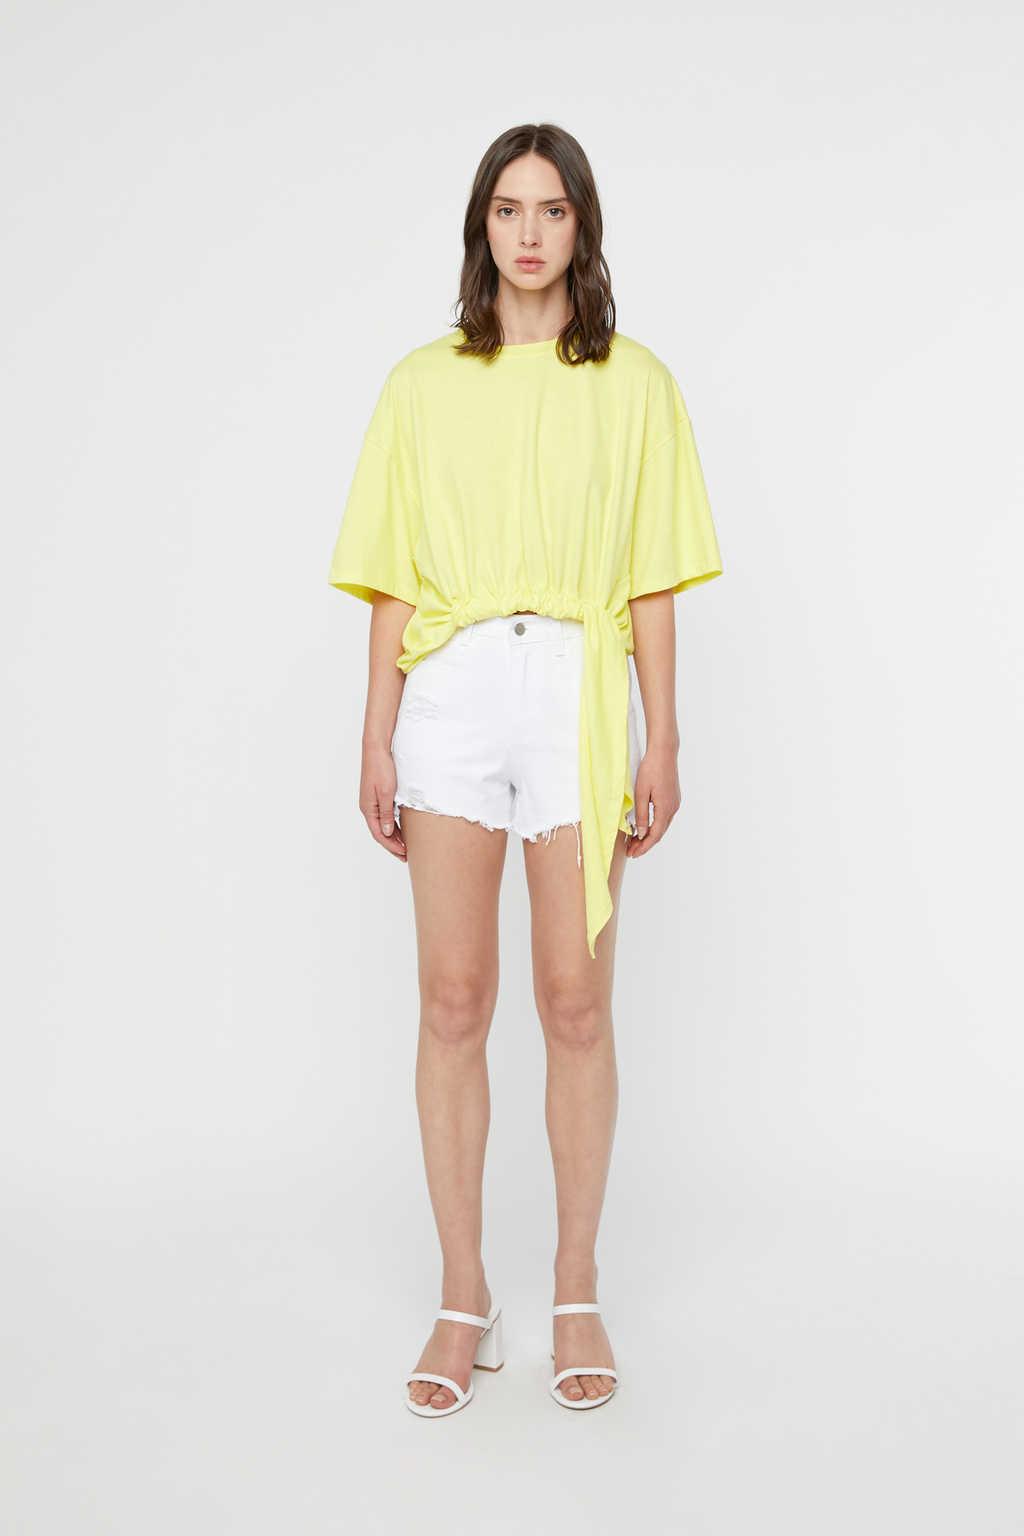 TShirt K151 Yellow 3